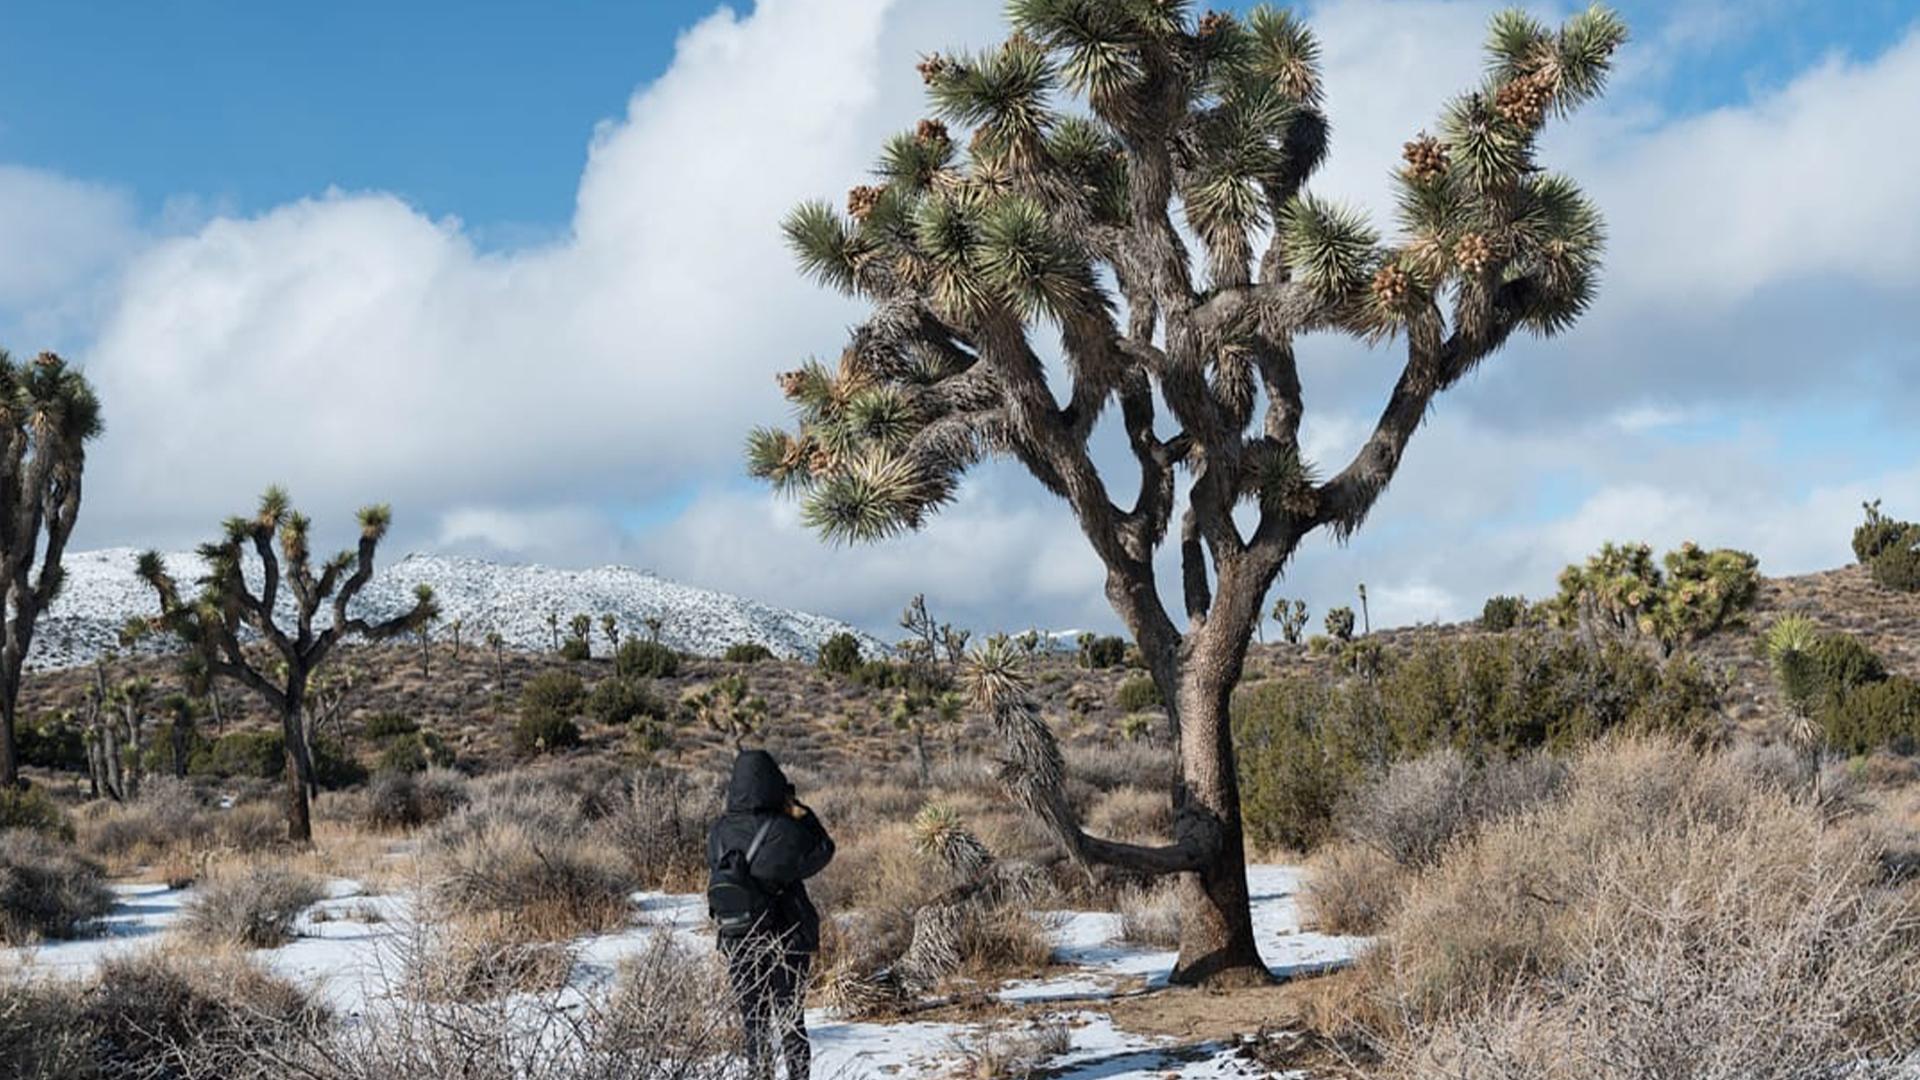 Photo of snow-covered Joshua trees